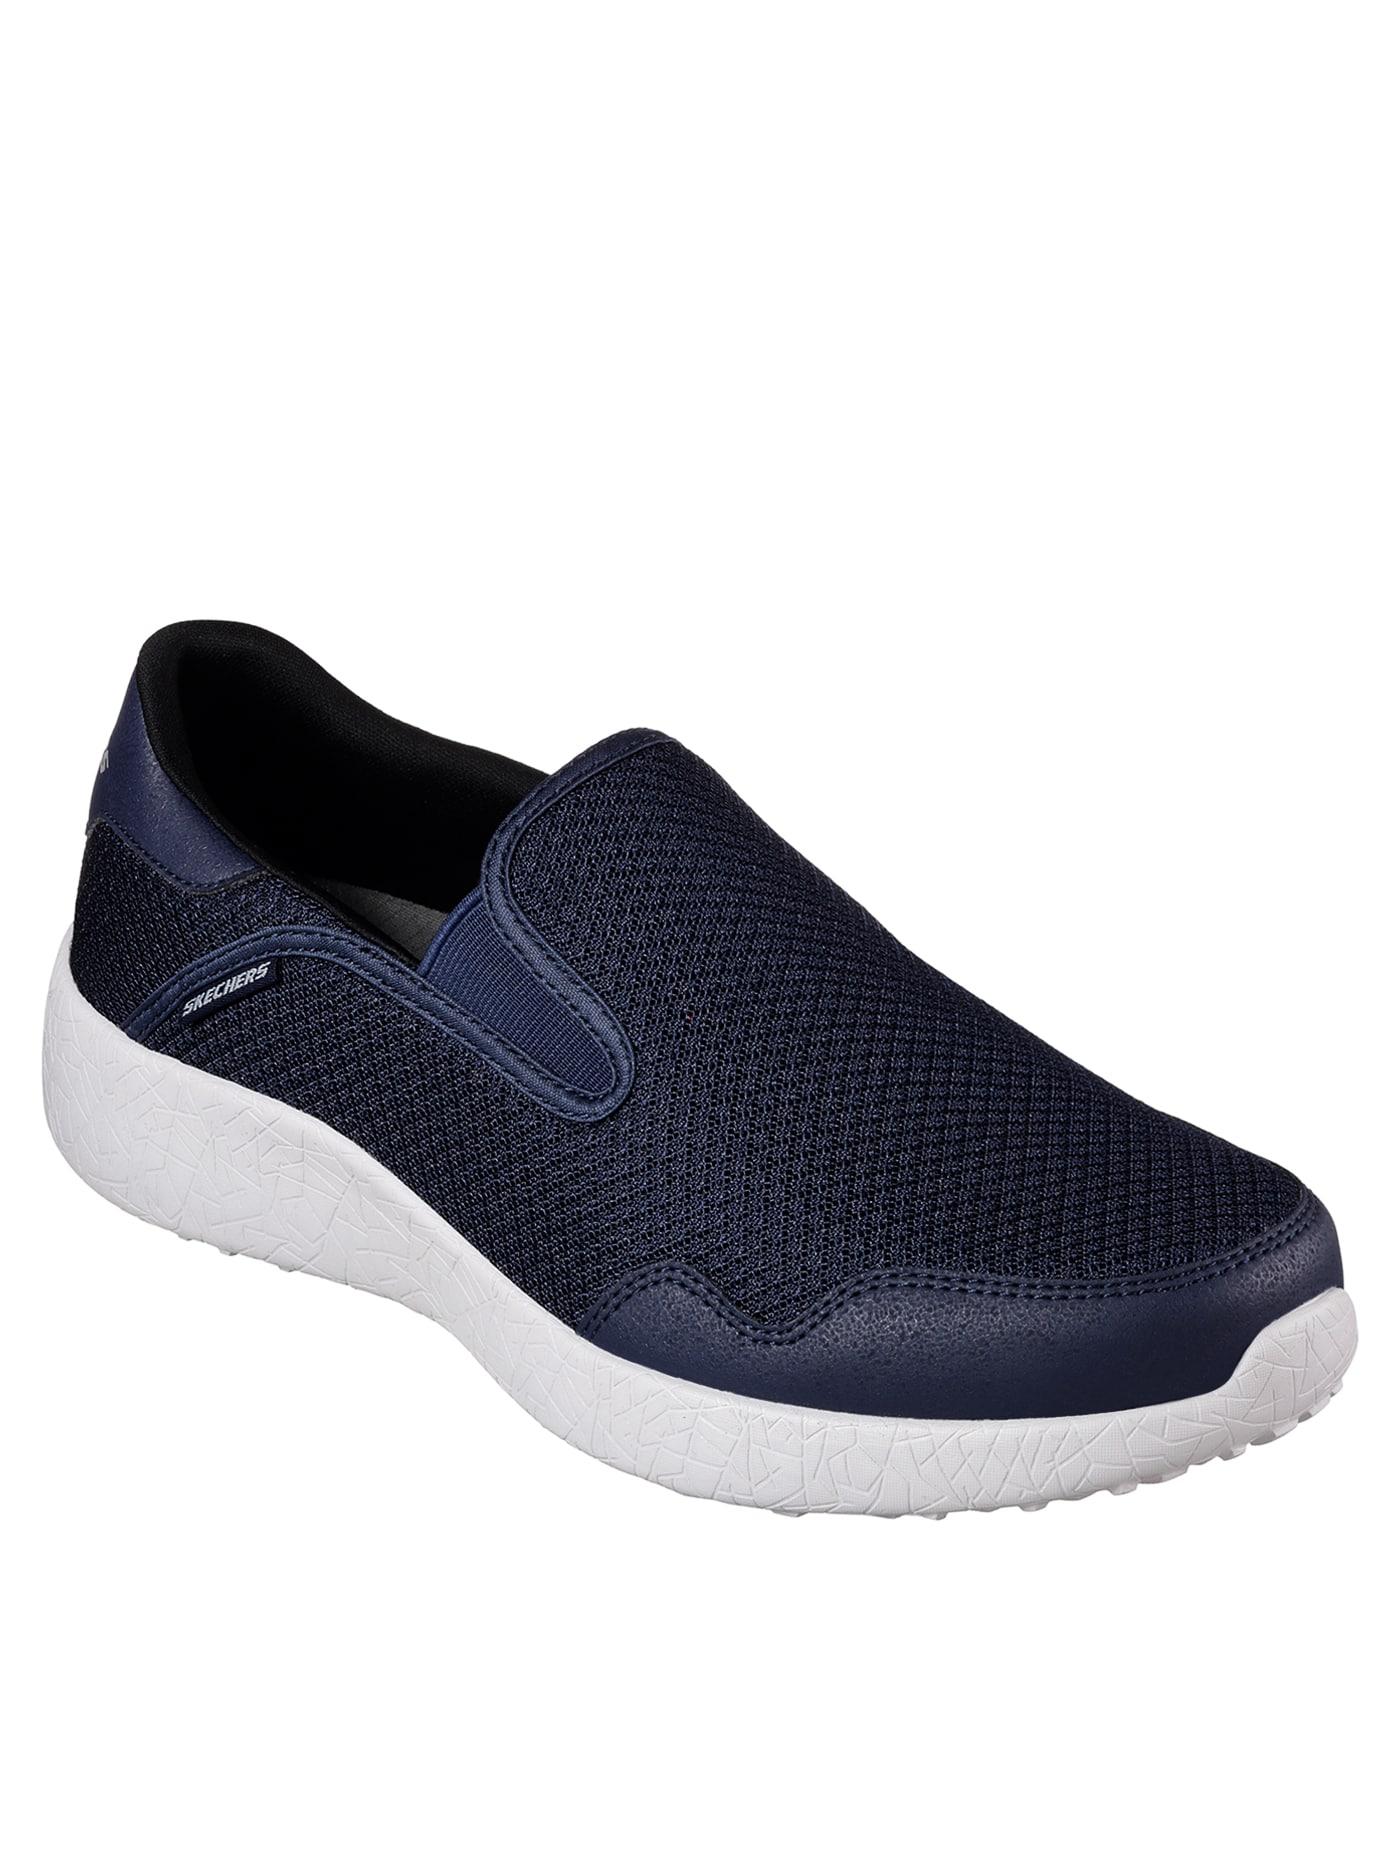 SKECHERS รองเท้าลำลองผู้ชาย รุ่น Burst